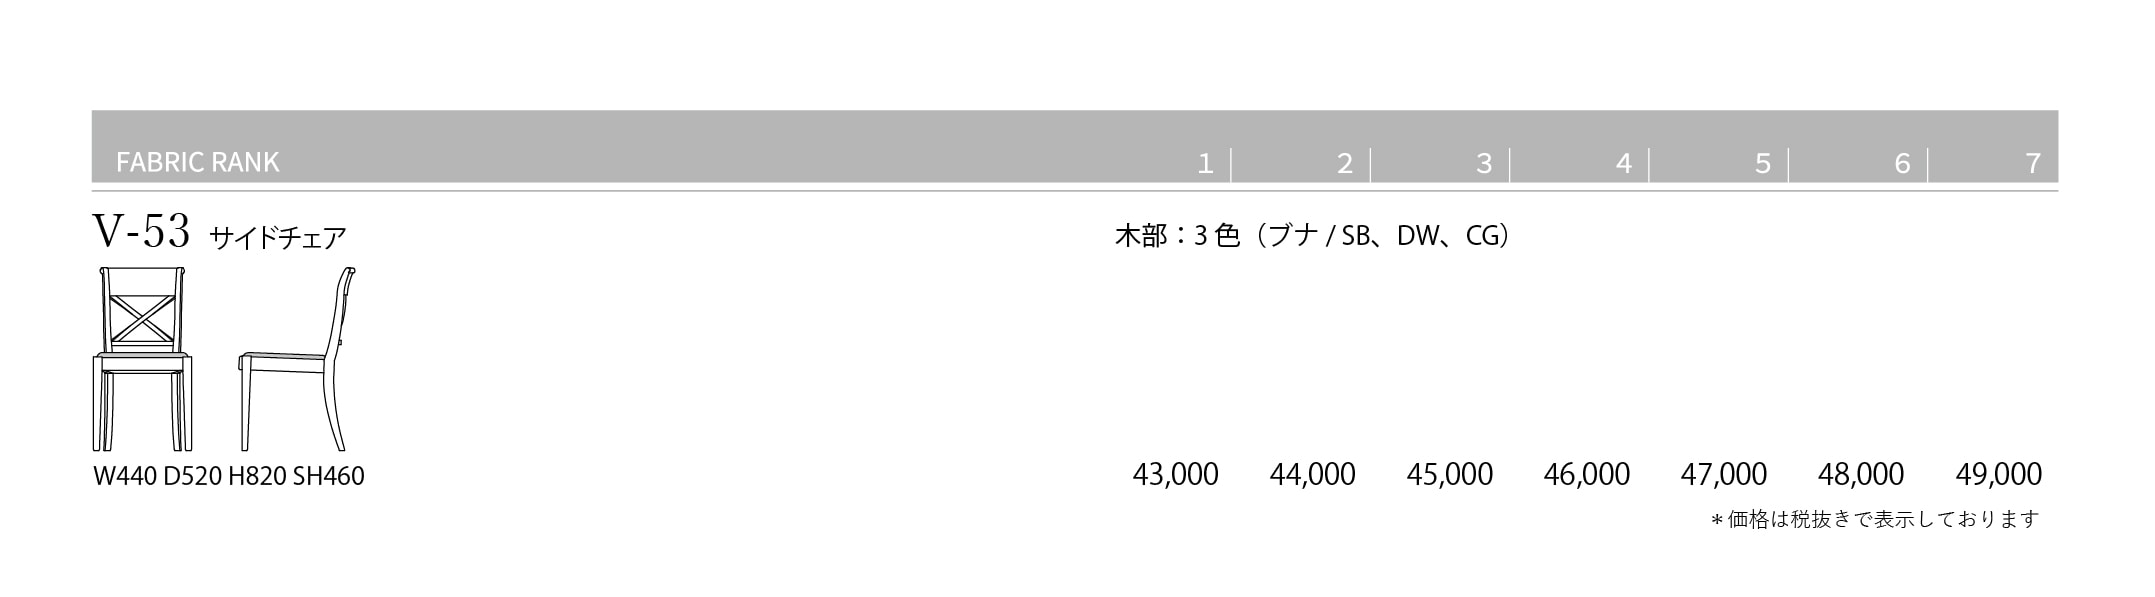 V-53 Price List